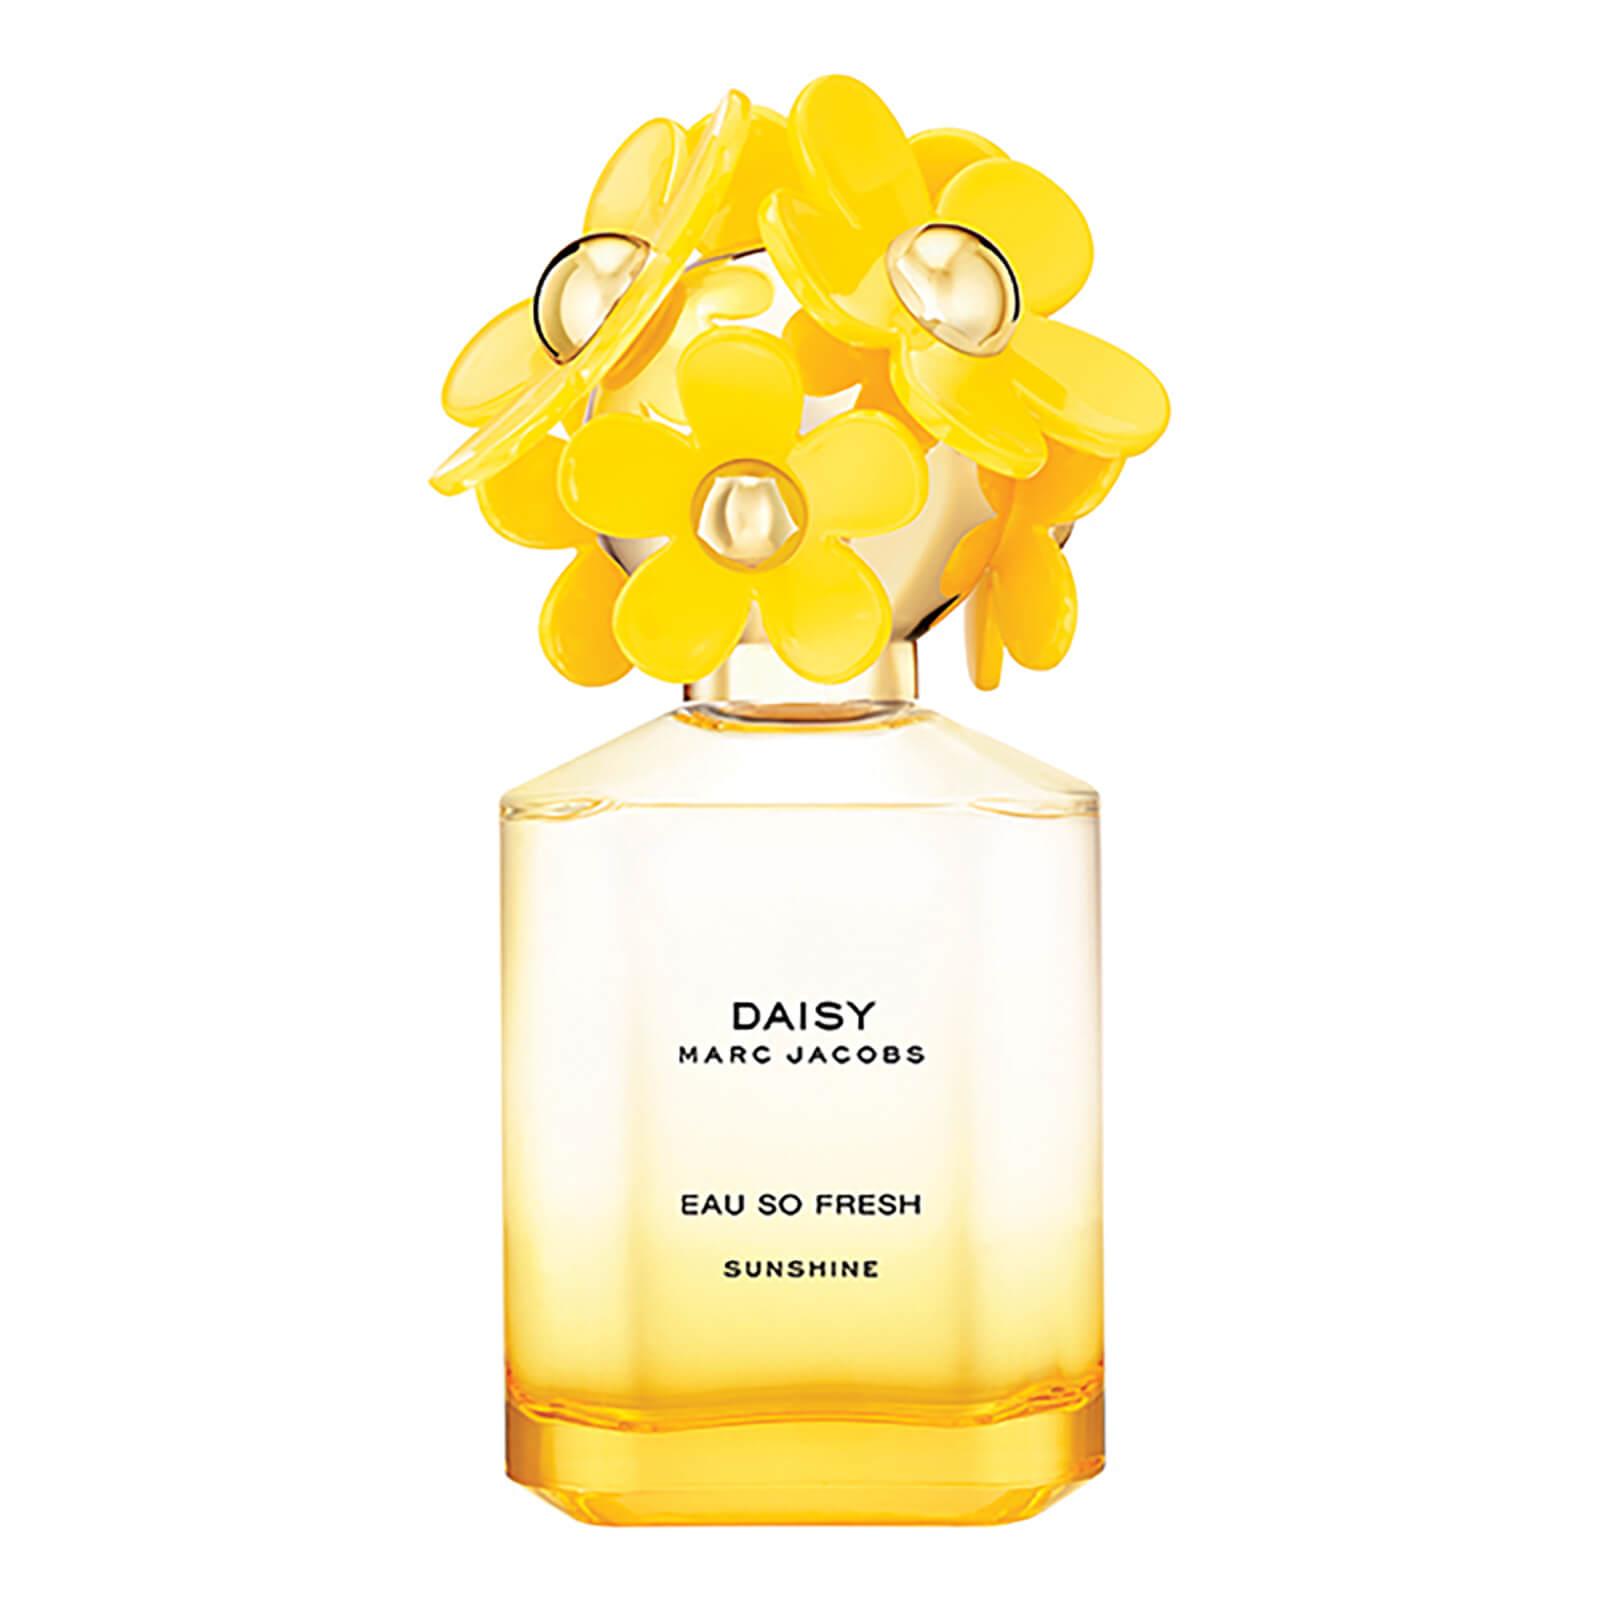 594589f97b Marc Jacobs Daisy Eau So Fresh Sunshine Eau de Toilette 75ml   Free  Shipping   Lookfantastic